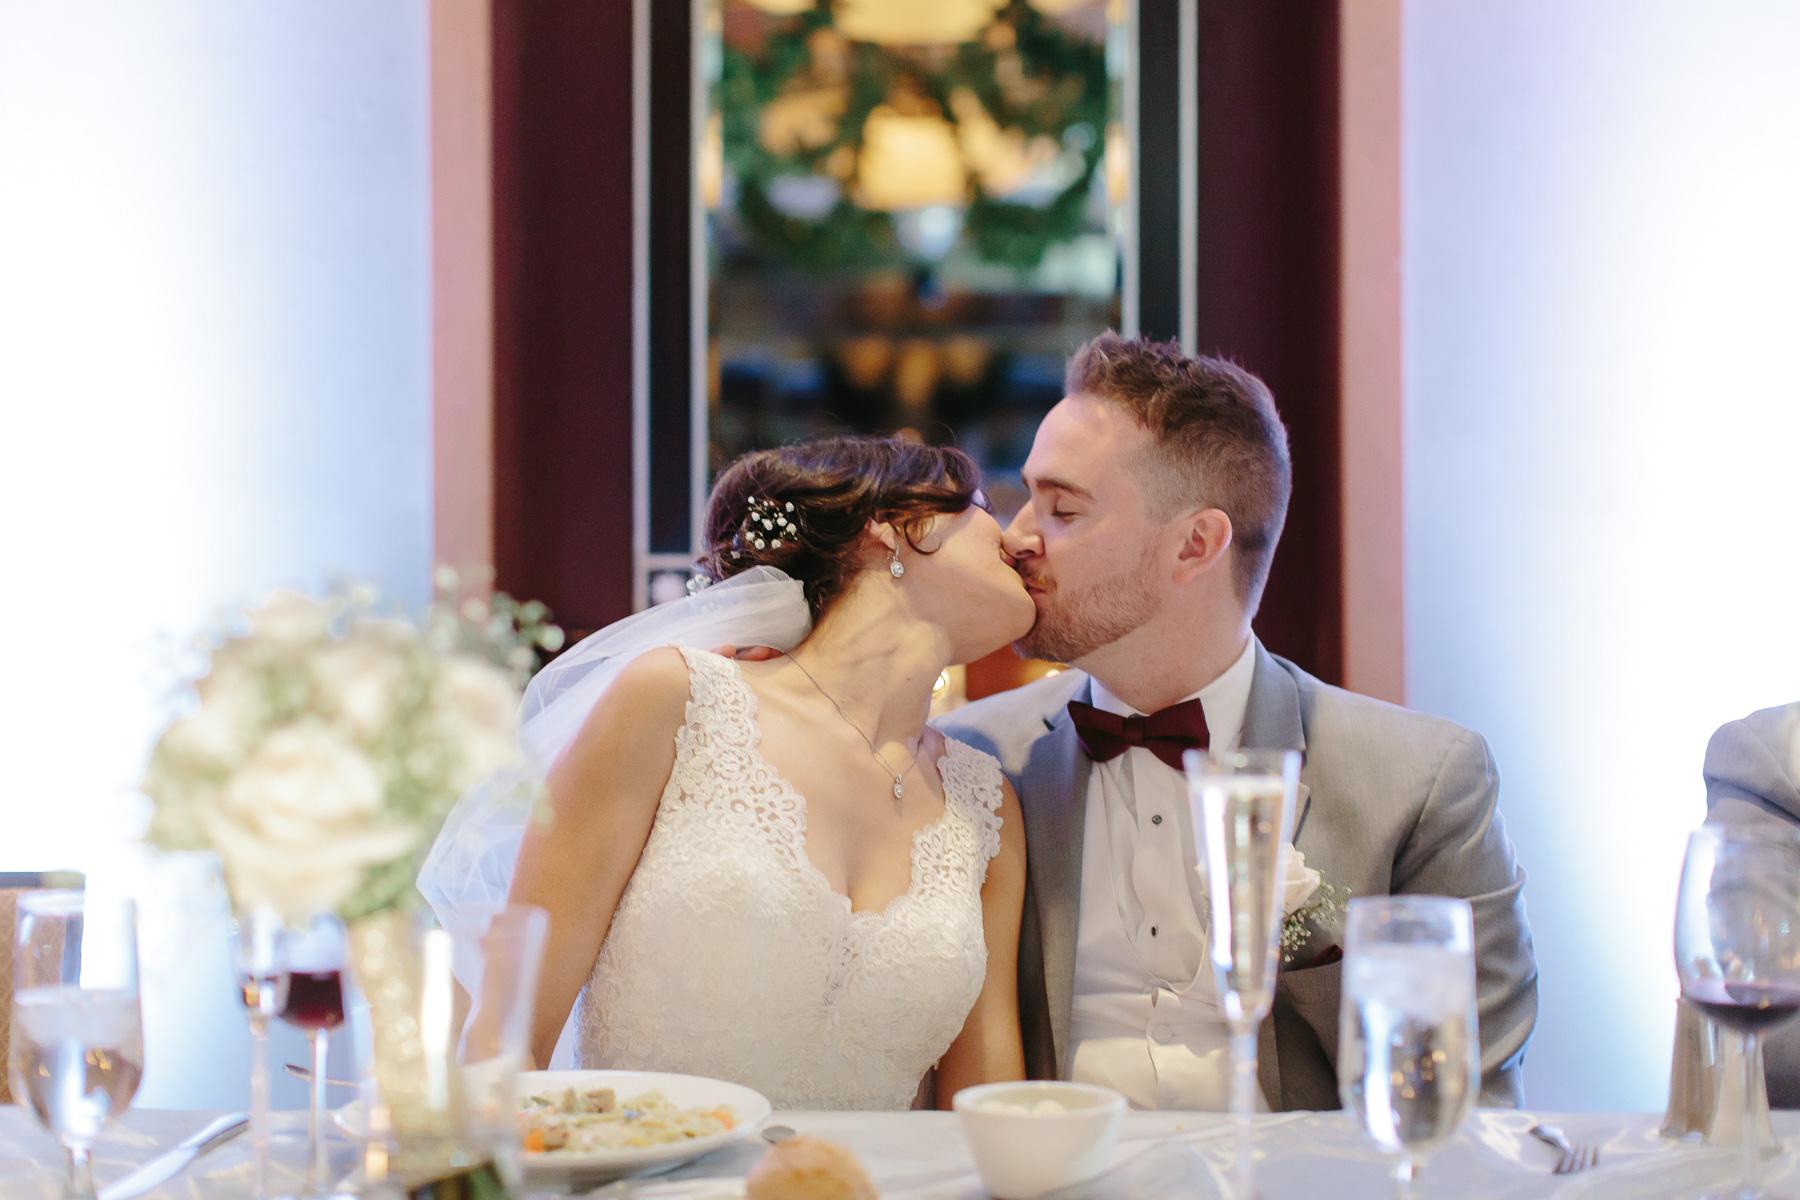 161210-Luxium-Weddings-Arizona-Matt-Jenny-Anthem-Golf-Country-Club-1063.jpg